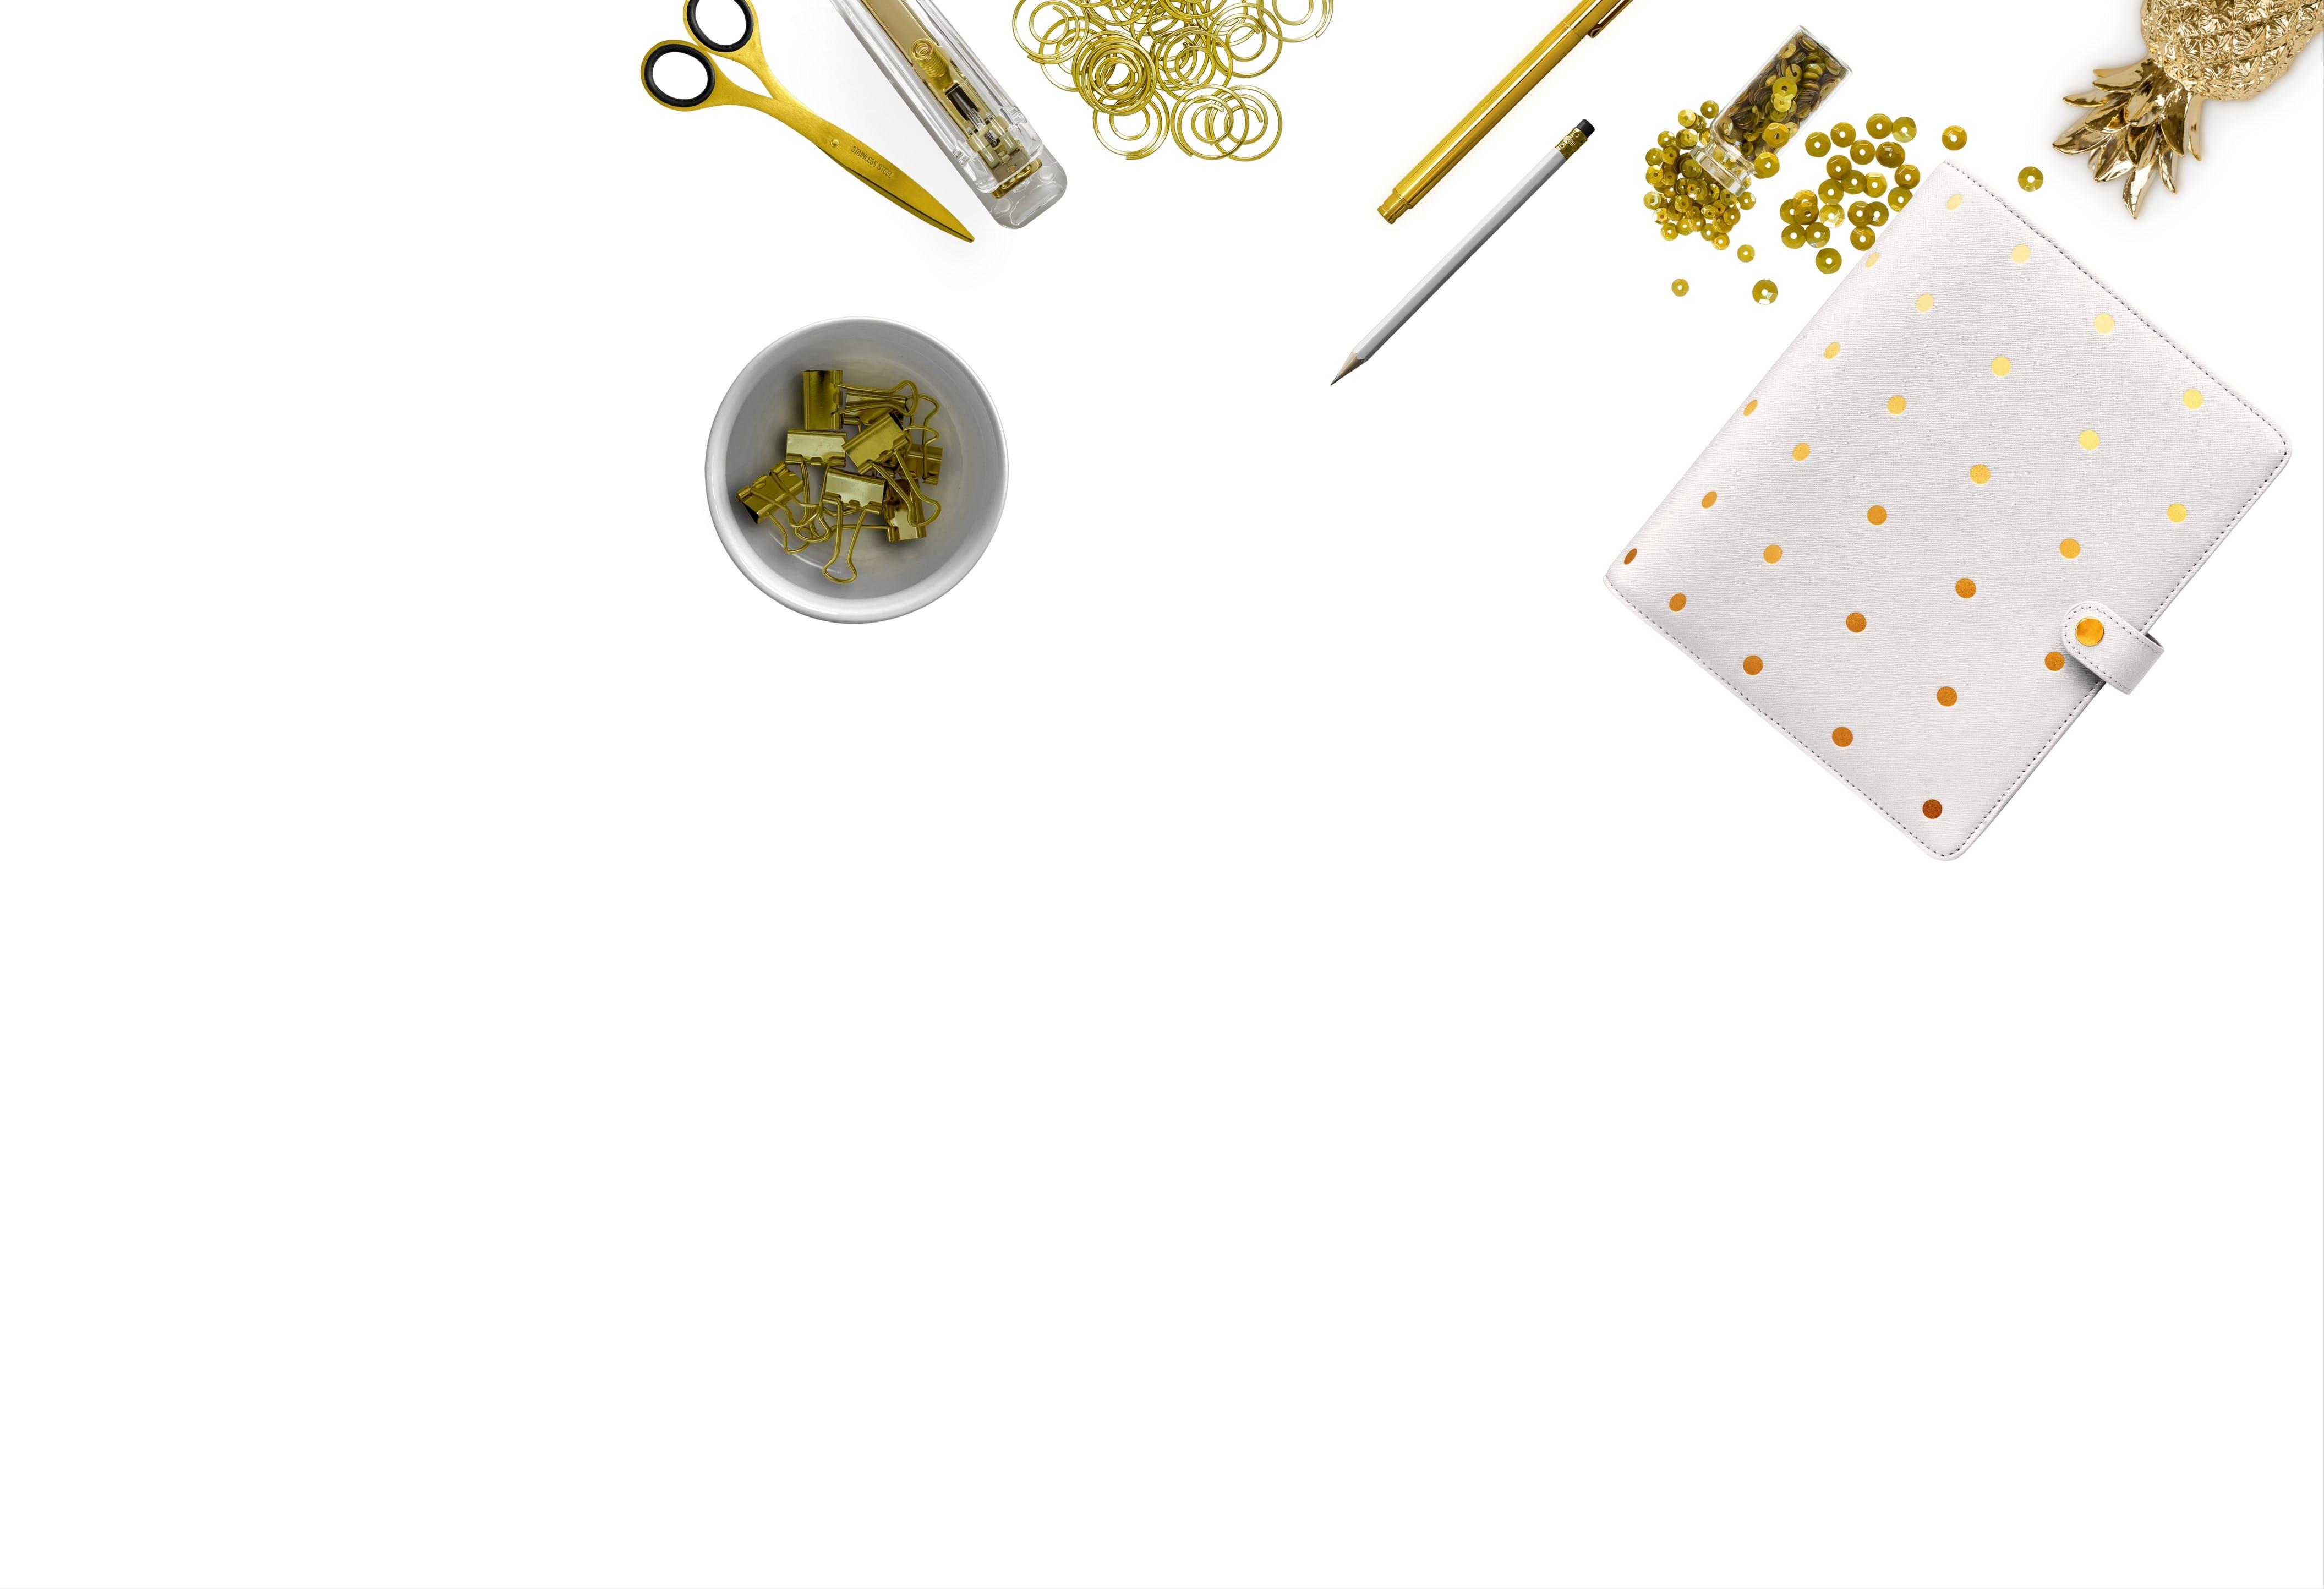 Kostenloses Stock Foto zu abbildung, design, flatlay, gold